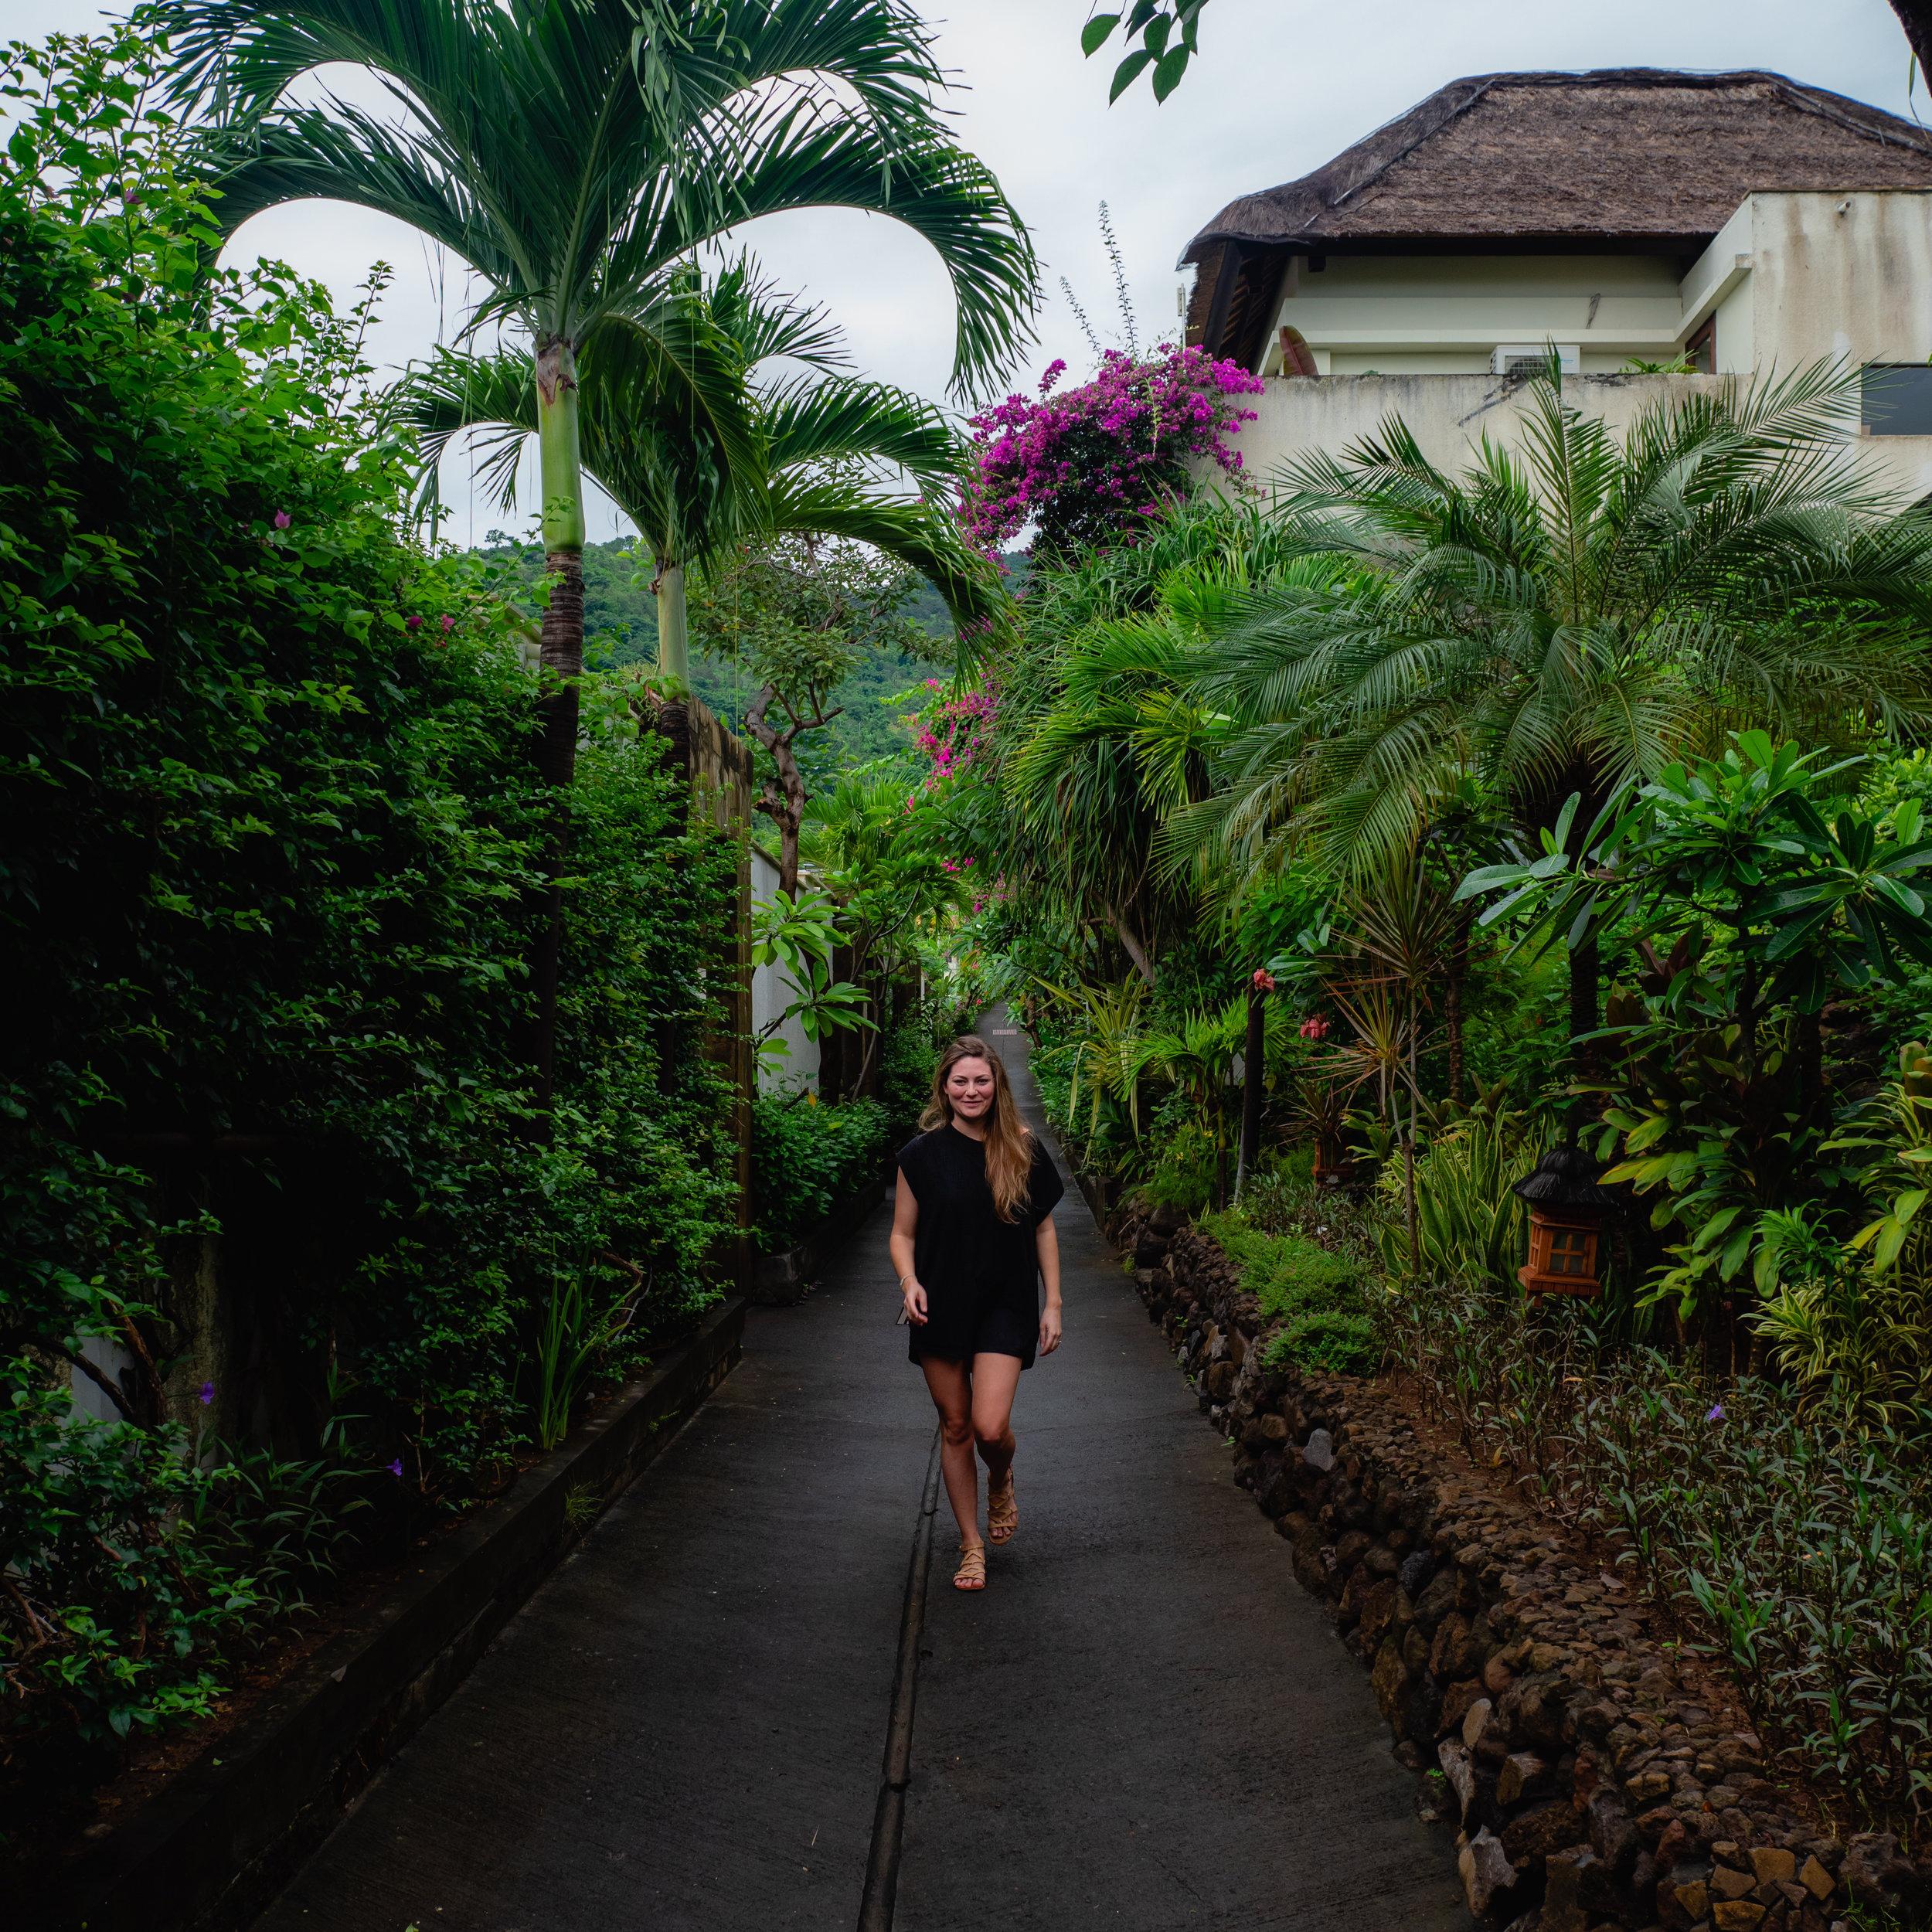 Jungle walking-instagram-4.jpg